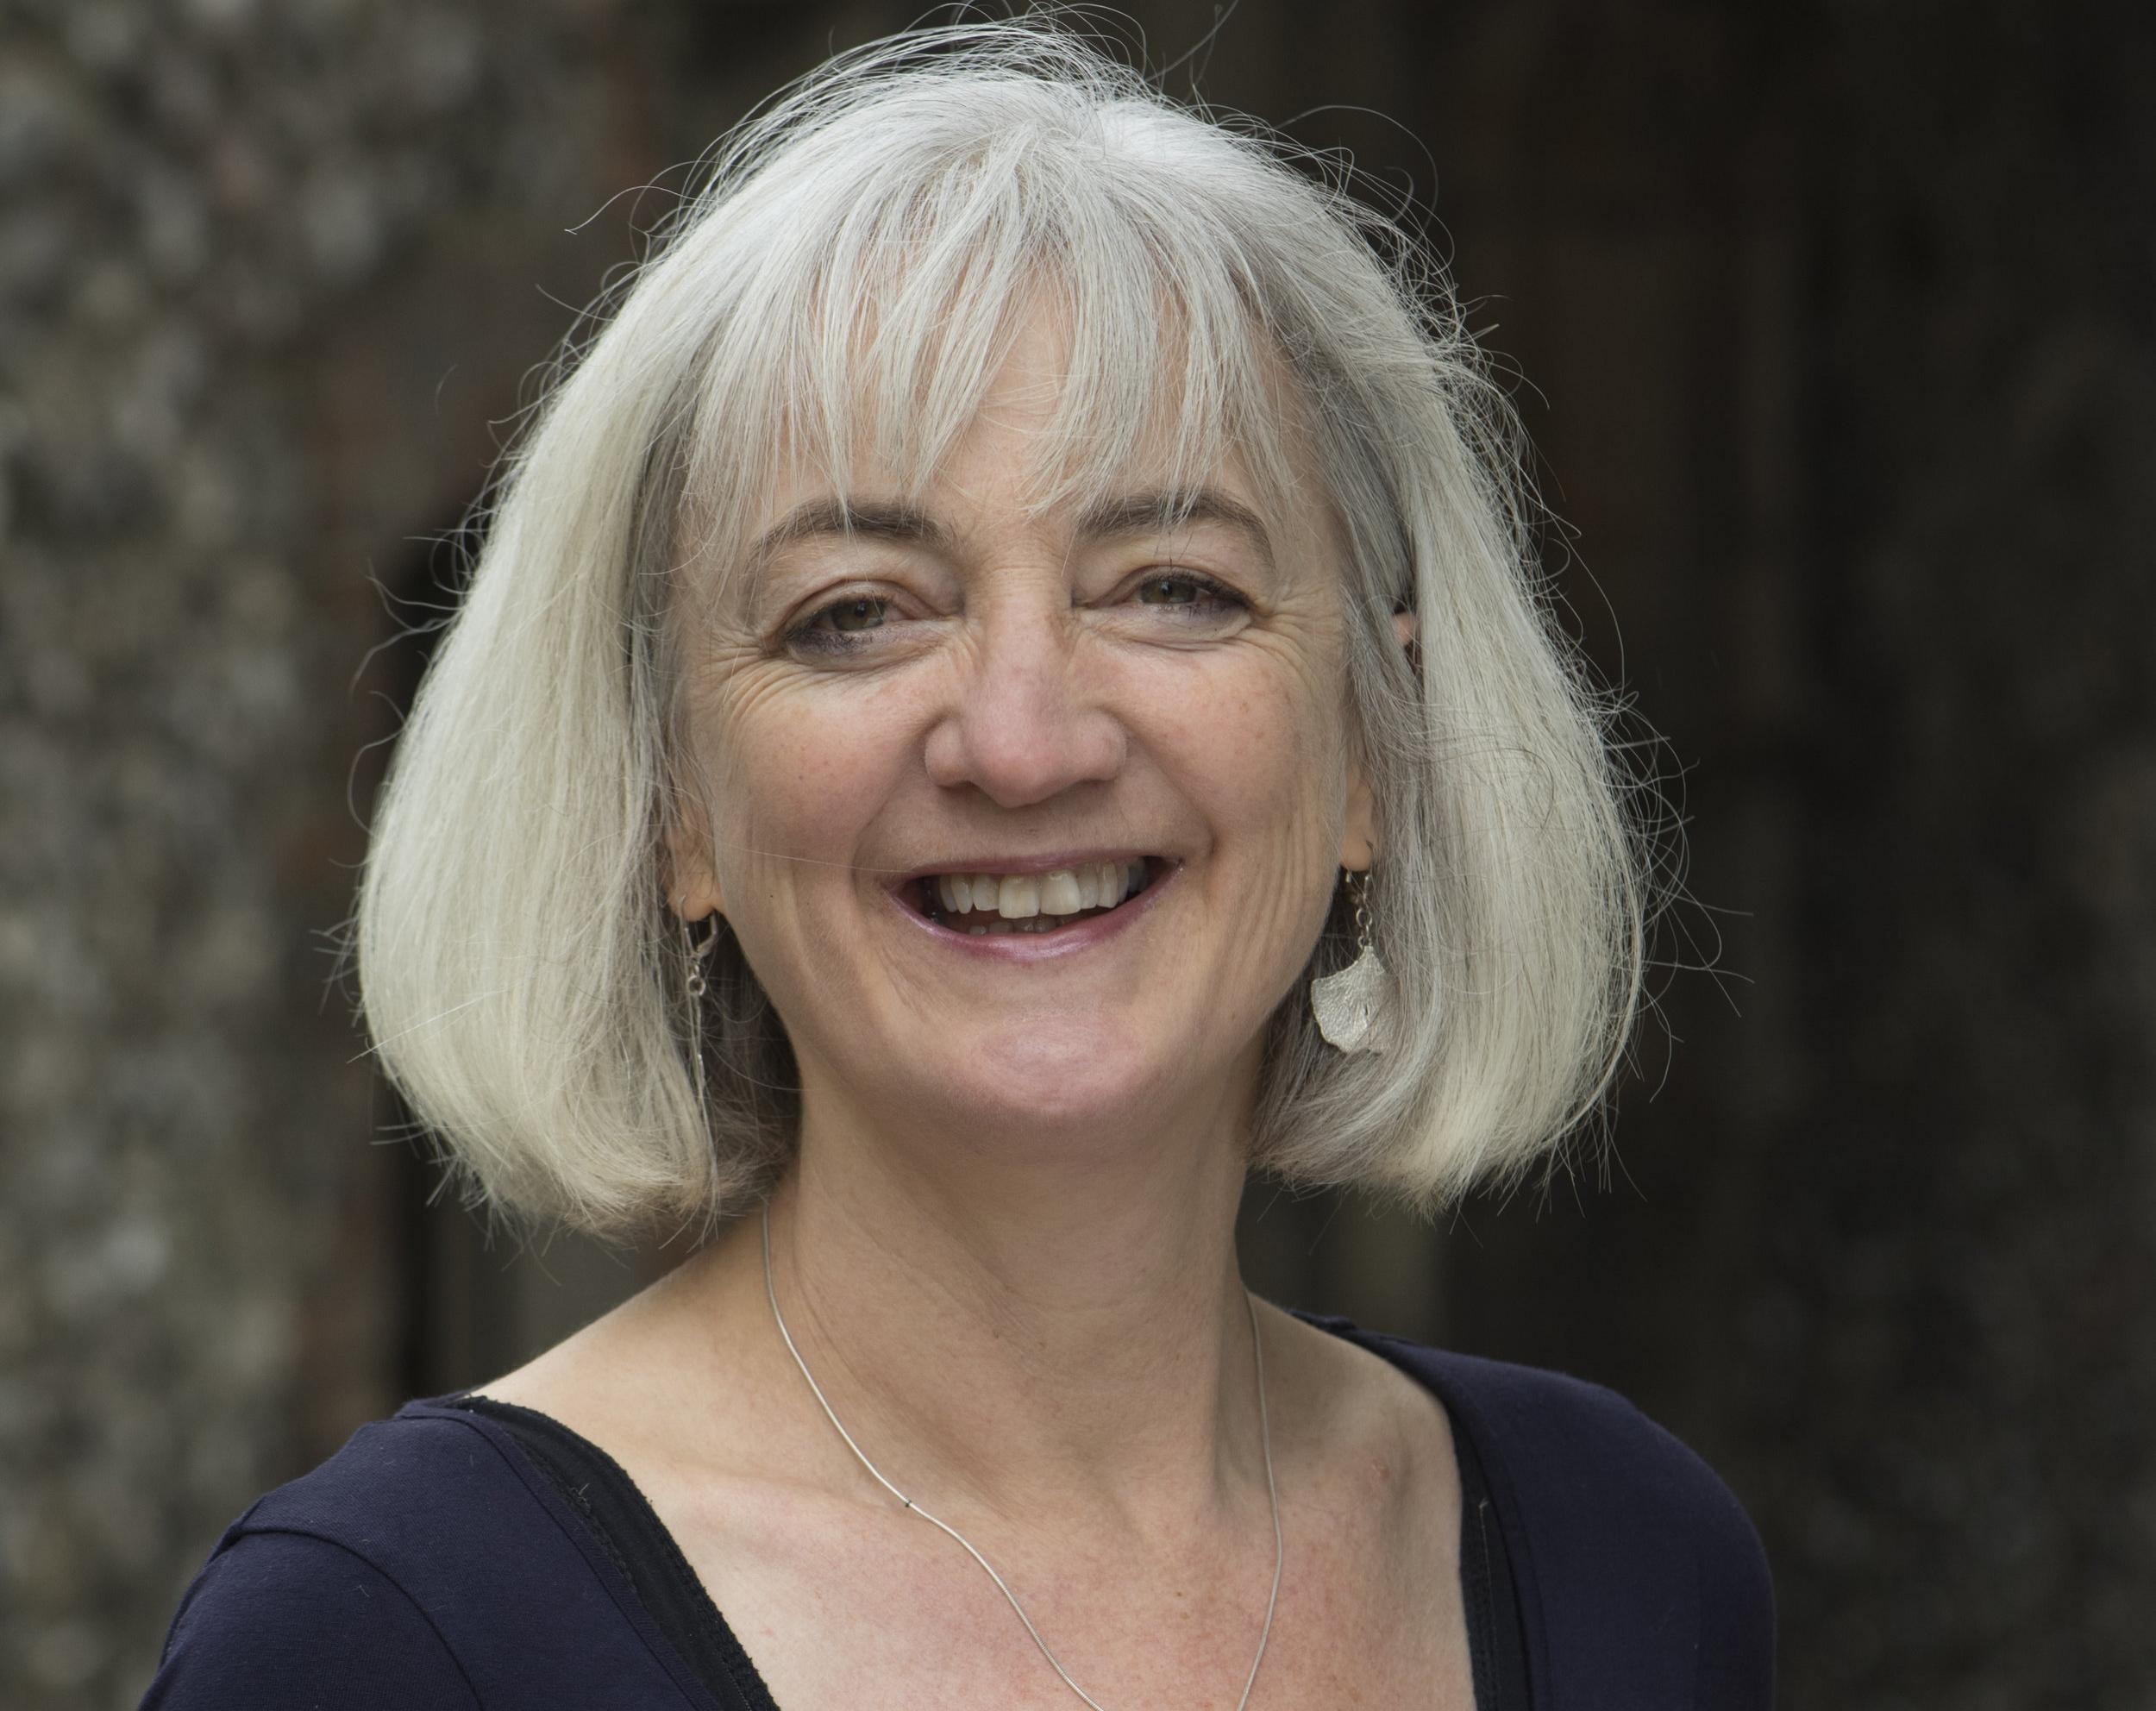 Katie Vandyck, Lewes website maker and photographer, by Marisa Guthrie